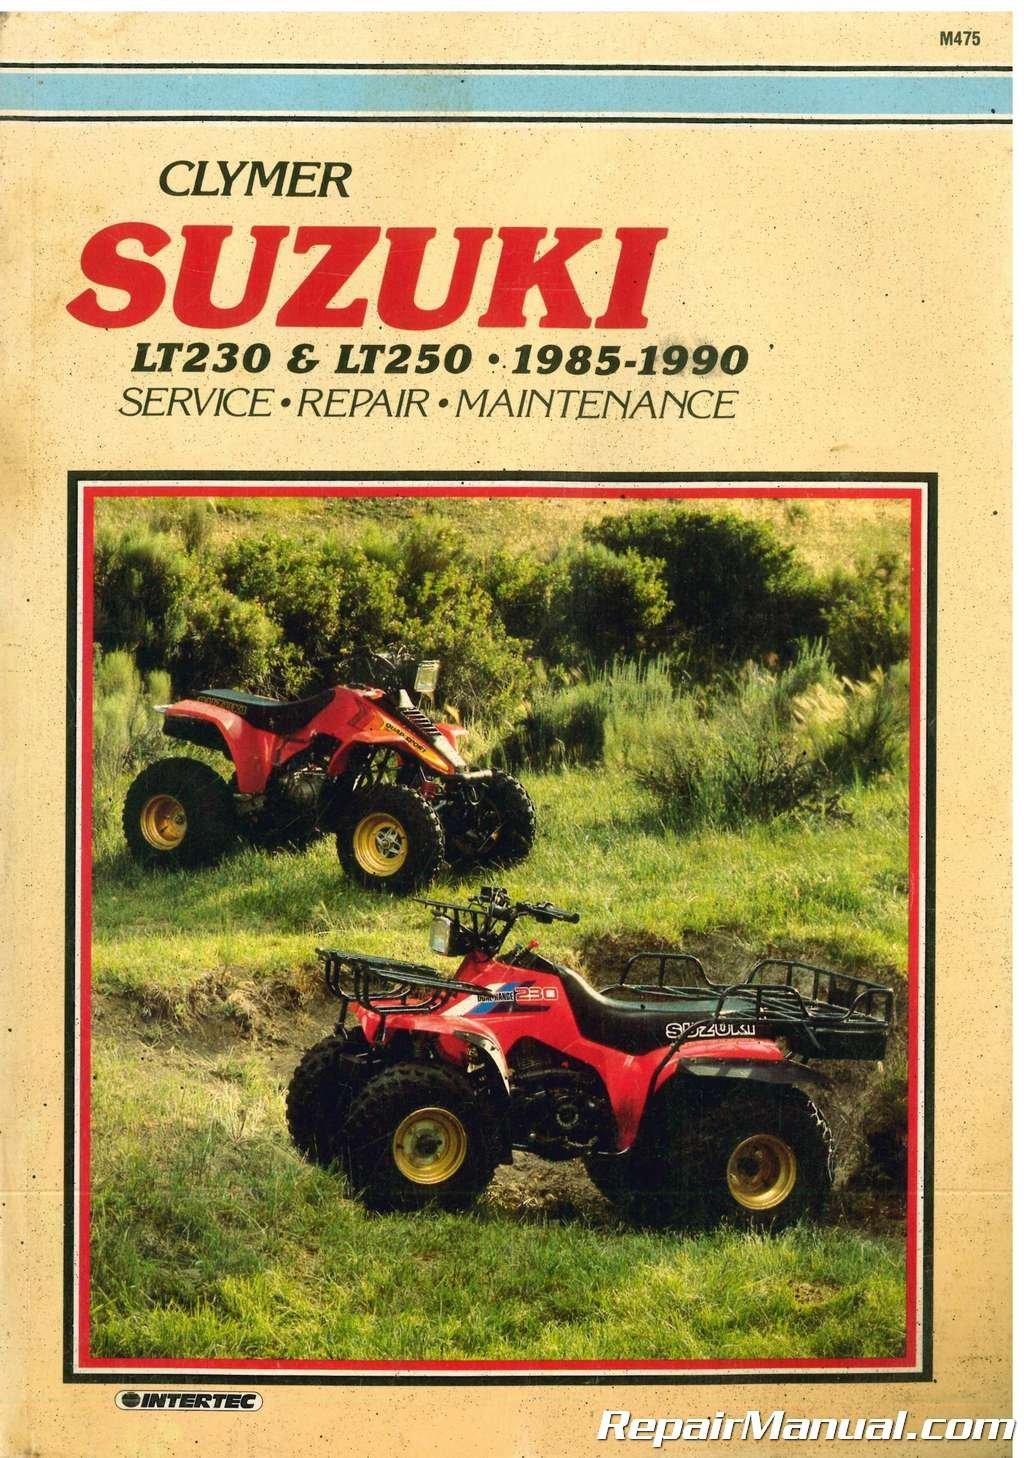 m475 1985-1990 suzuki lt230 lt250 atv repair manual by clymer paperback –  2004